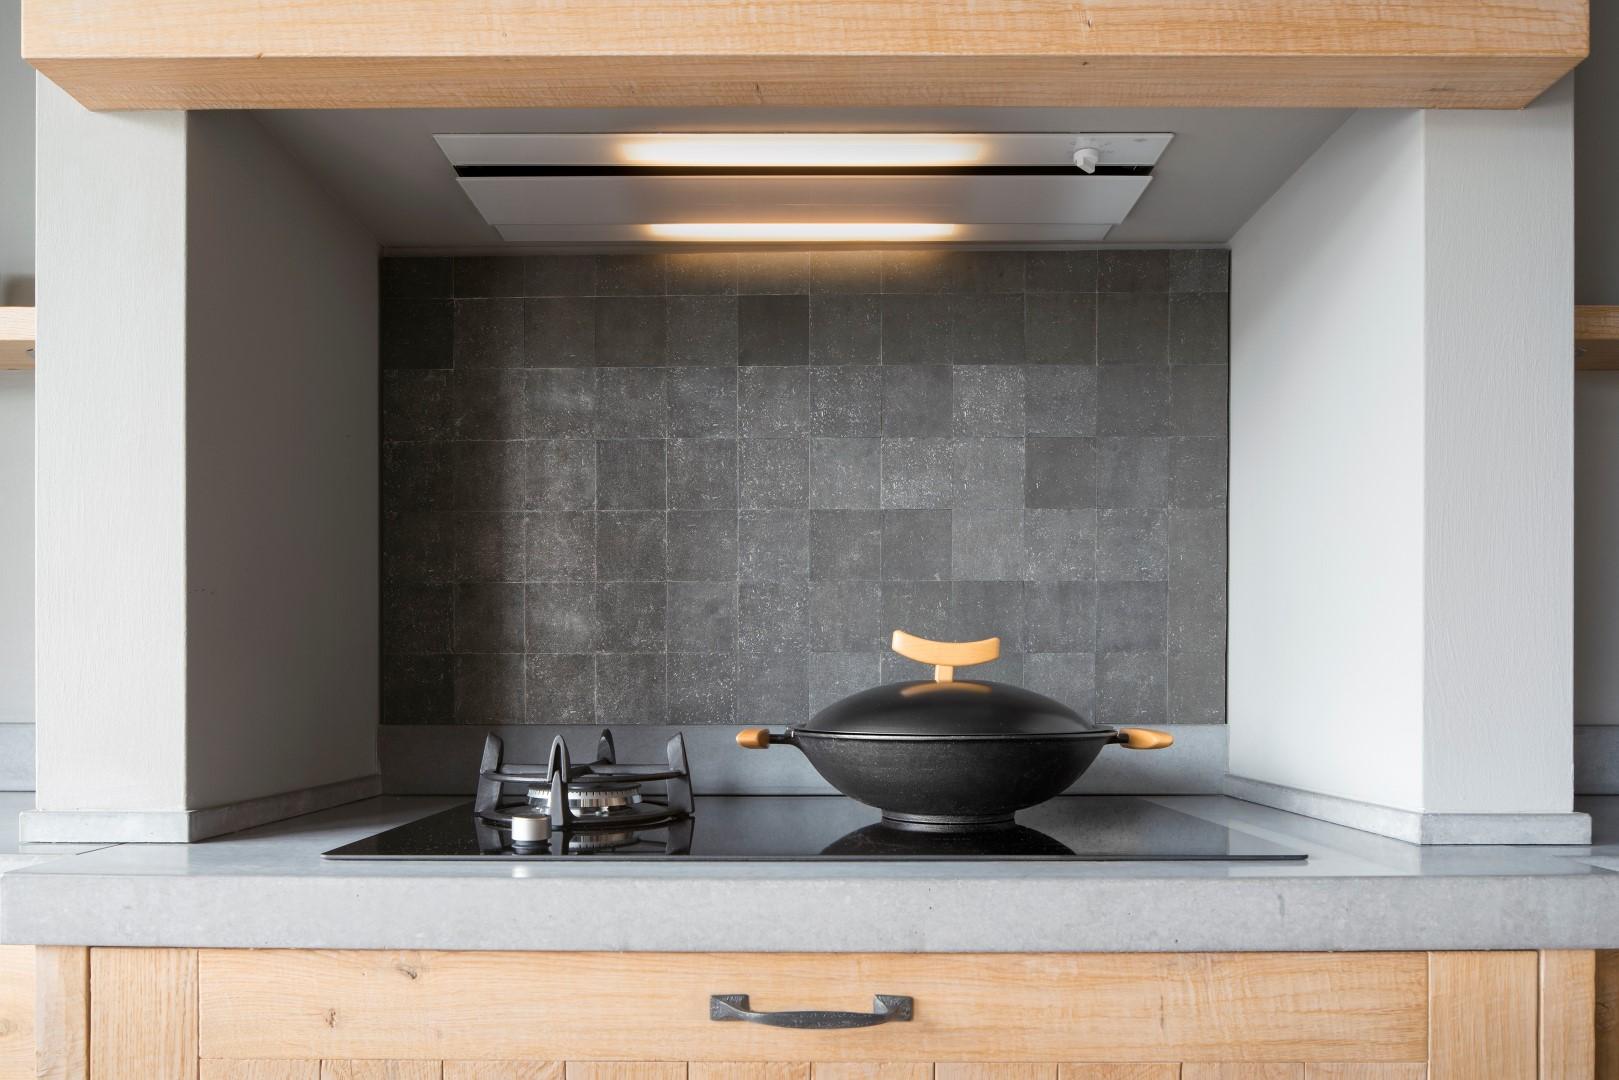 Keuken achterwand unieke tegels Pure Tiles via Dauby